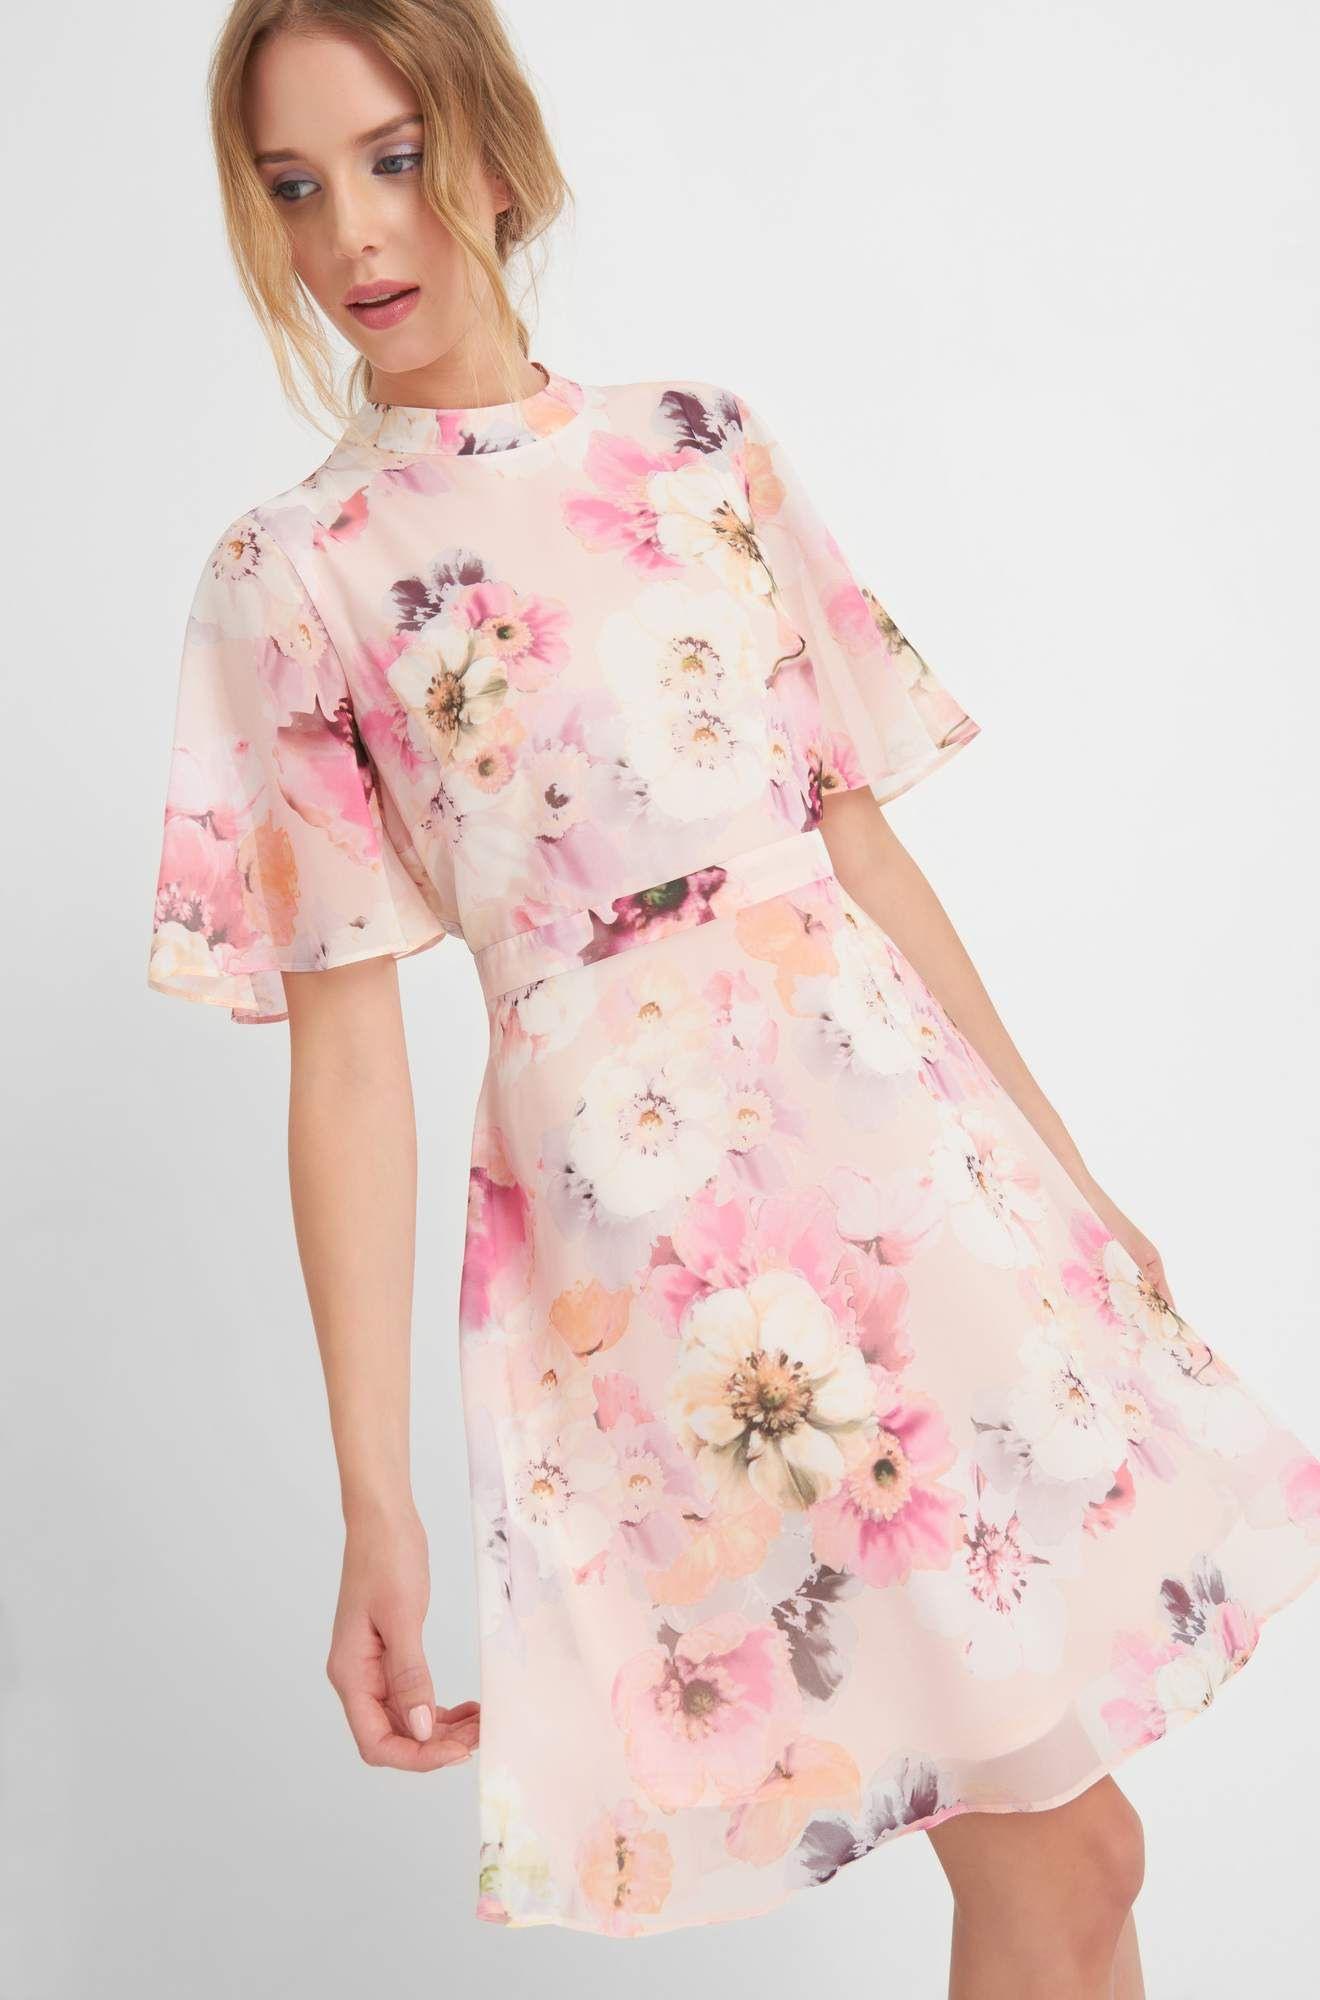 13 Perfekt Orsay Abend Kleider Design15 Elegant Orsay Abend Kleider Boutique